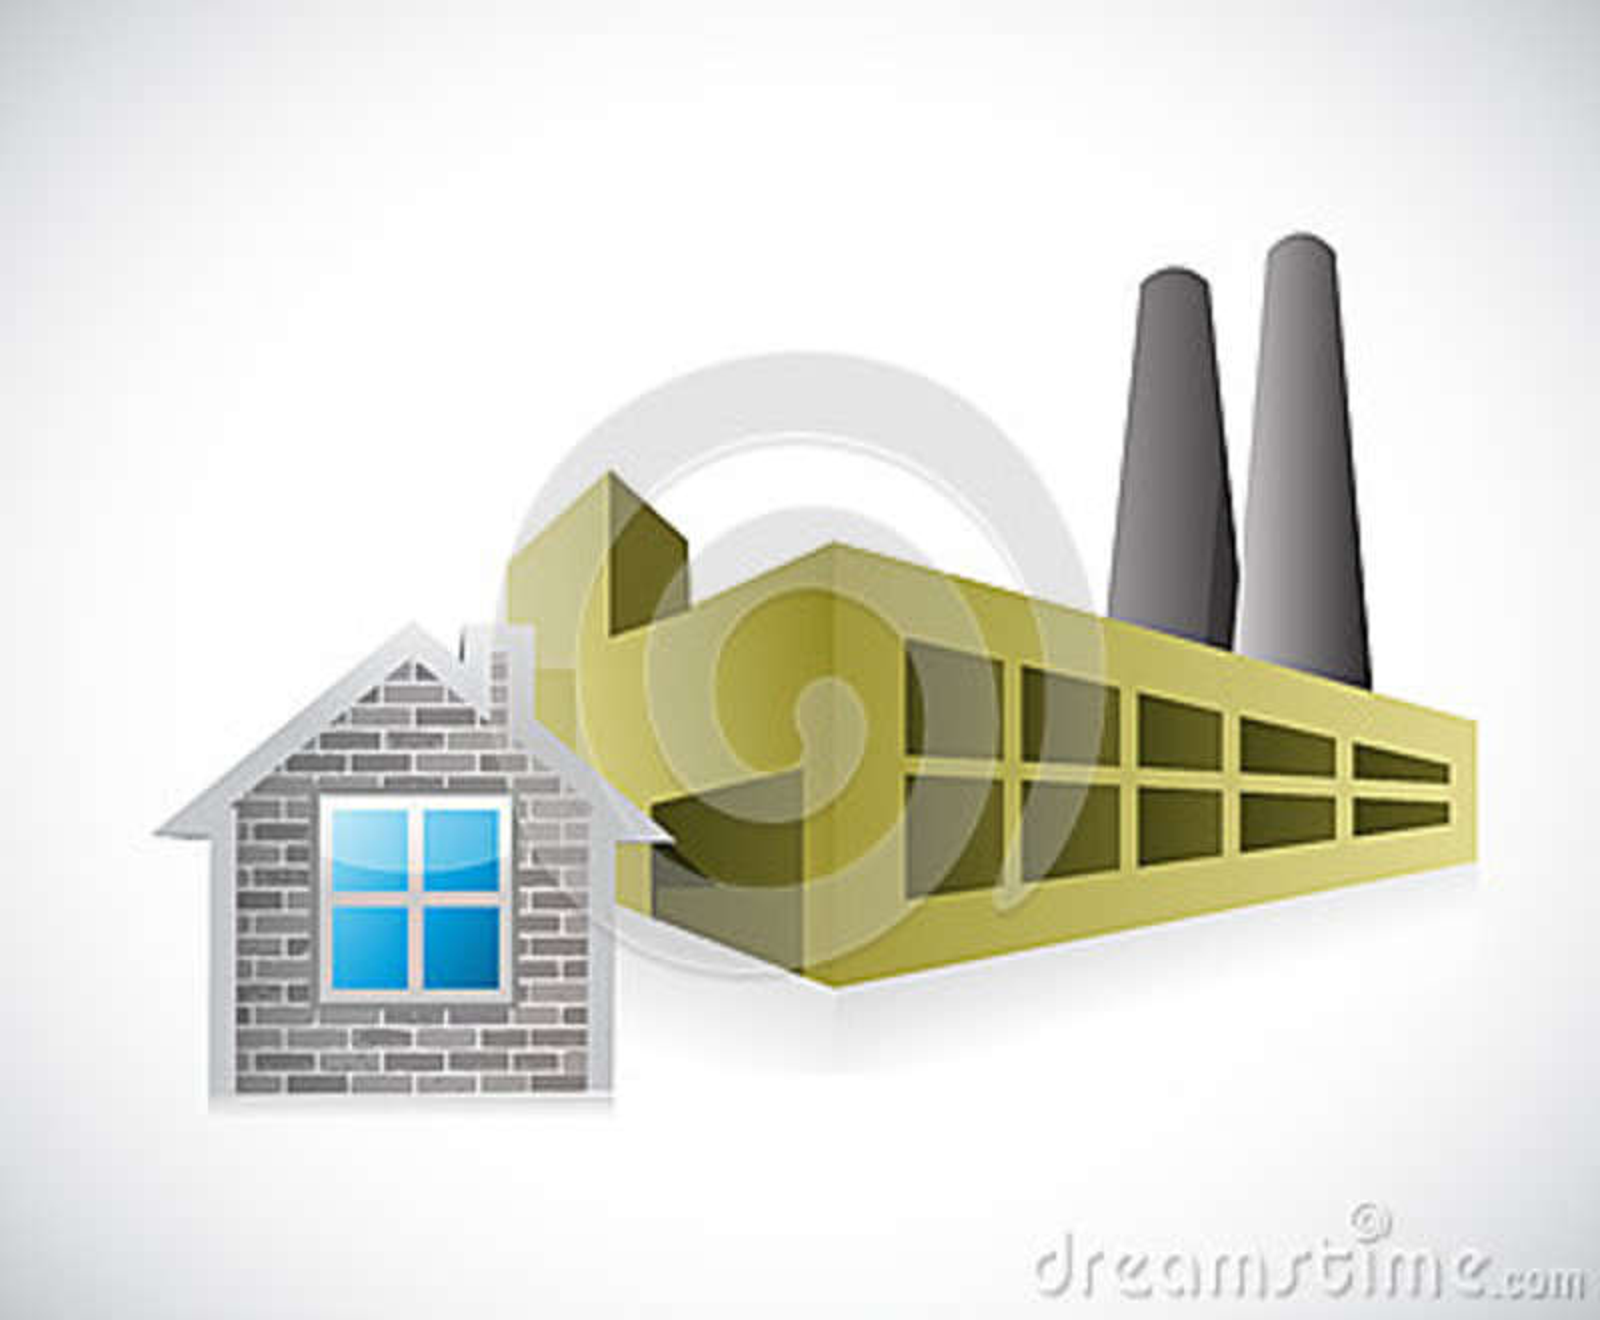 Home factory illustration design